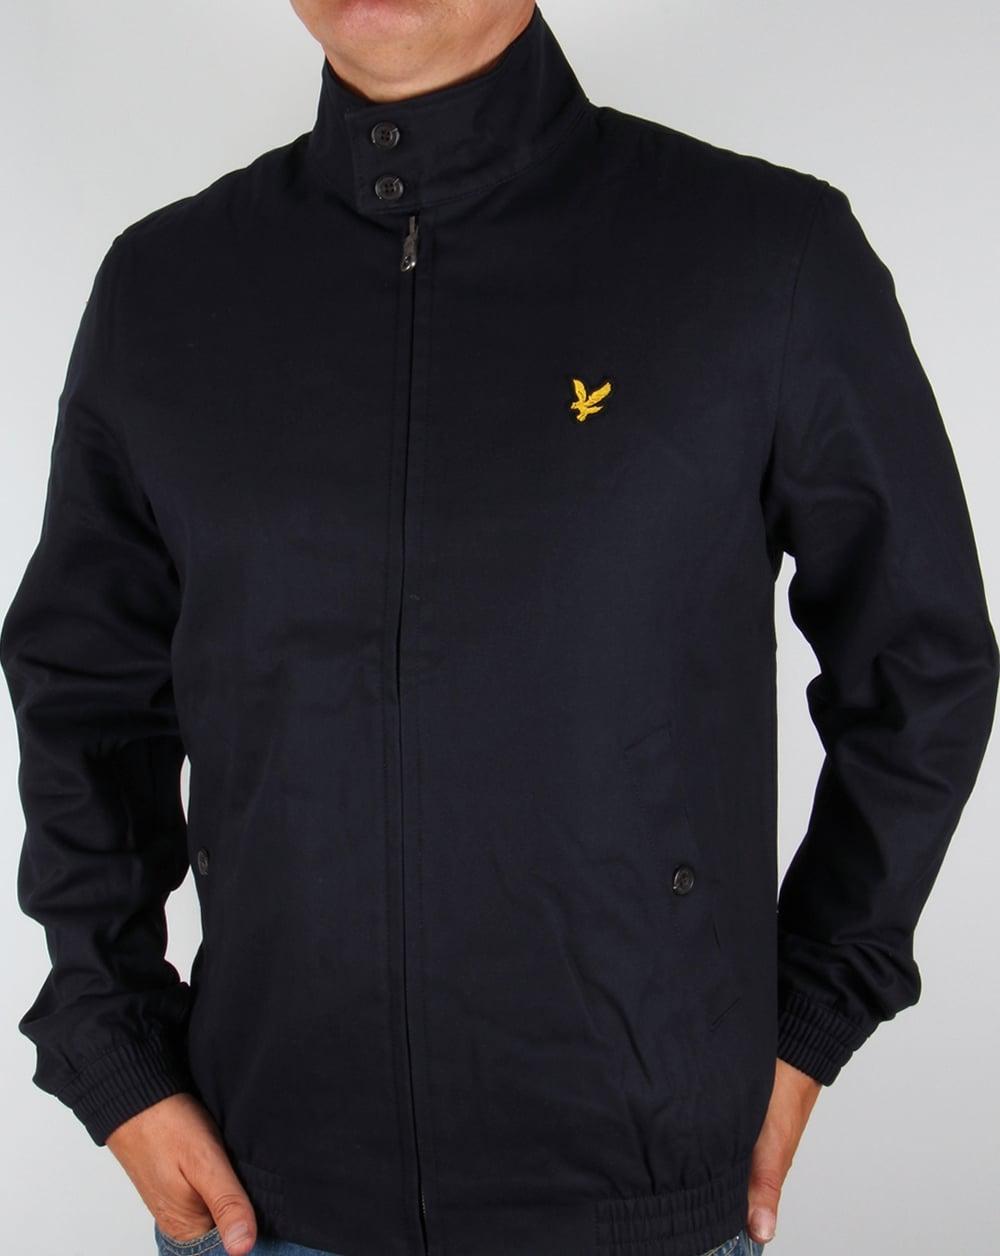 lyle and scott check lined harrington jacket navy mens coat. Black Bedroom Furniture Sets. Home Design Ideas